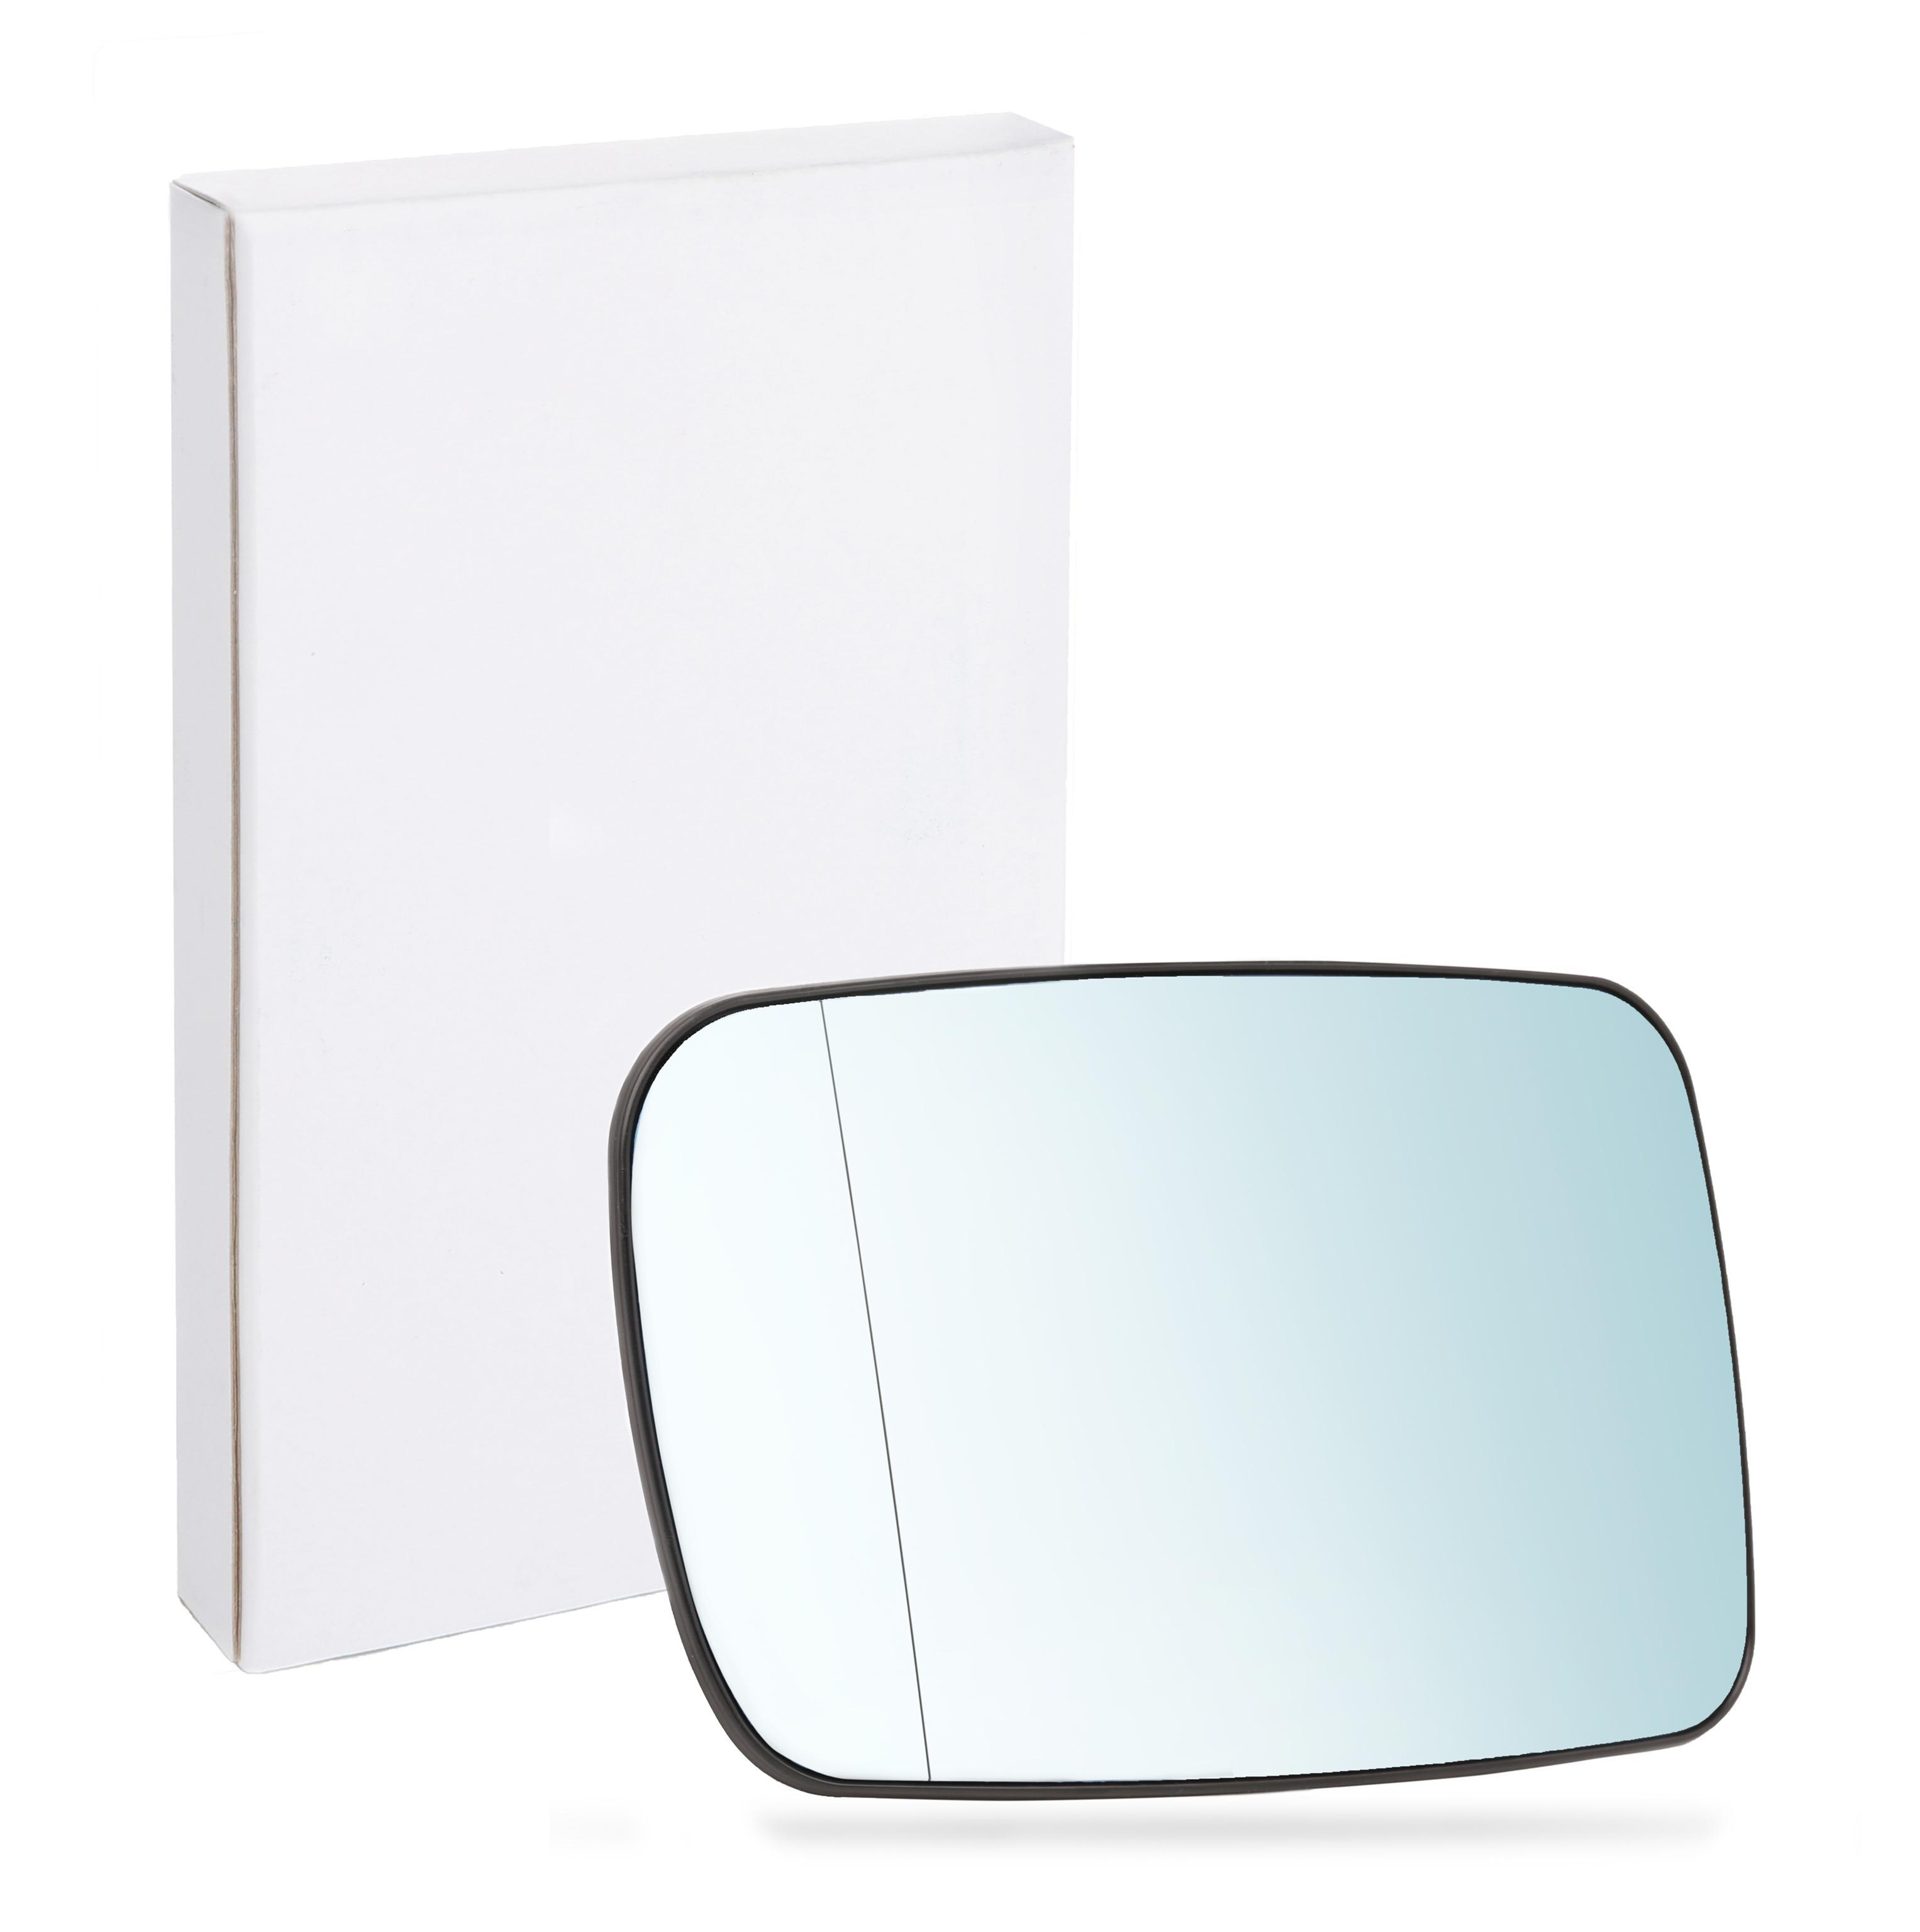 OE Original Spiegelglas 20 08 37-84 JOHNS